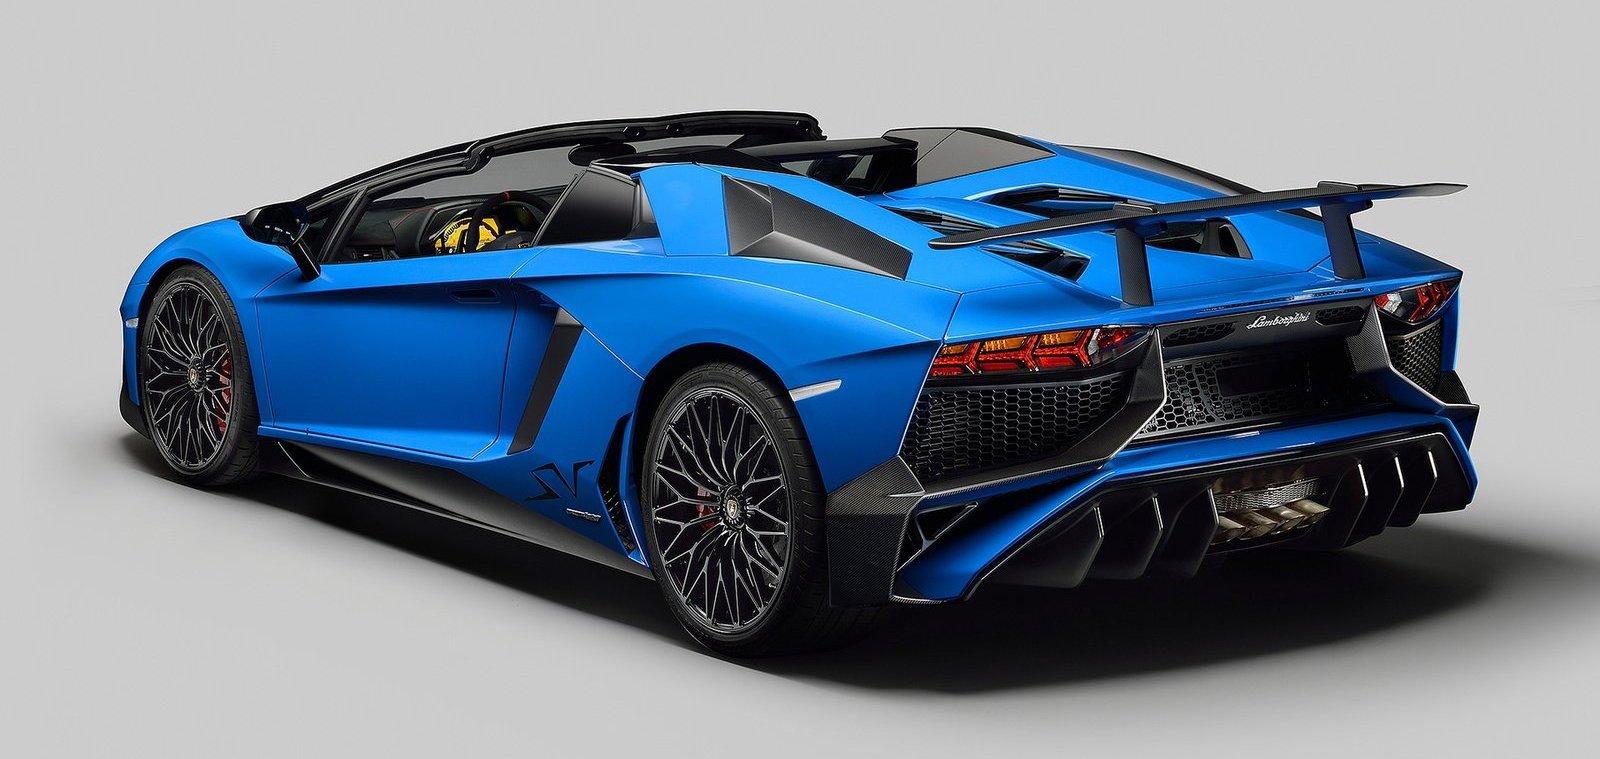 Lamborghini Aventador LP750,4 SV Roadster launched